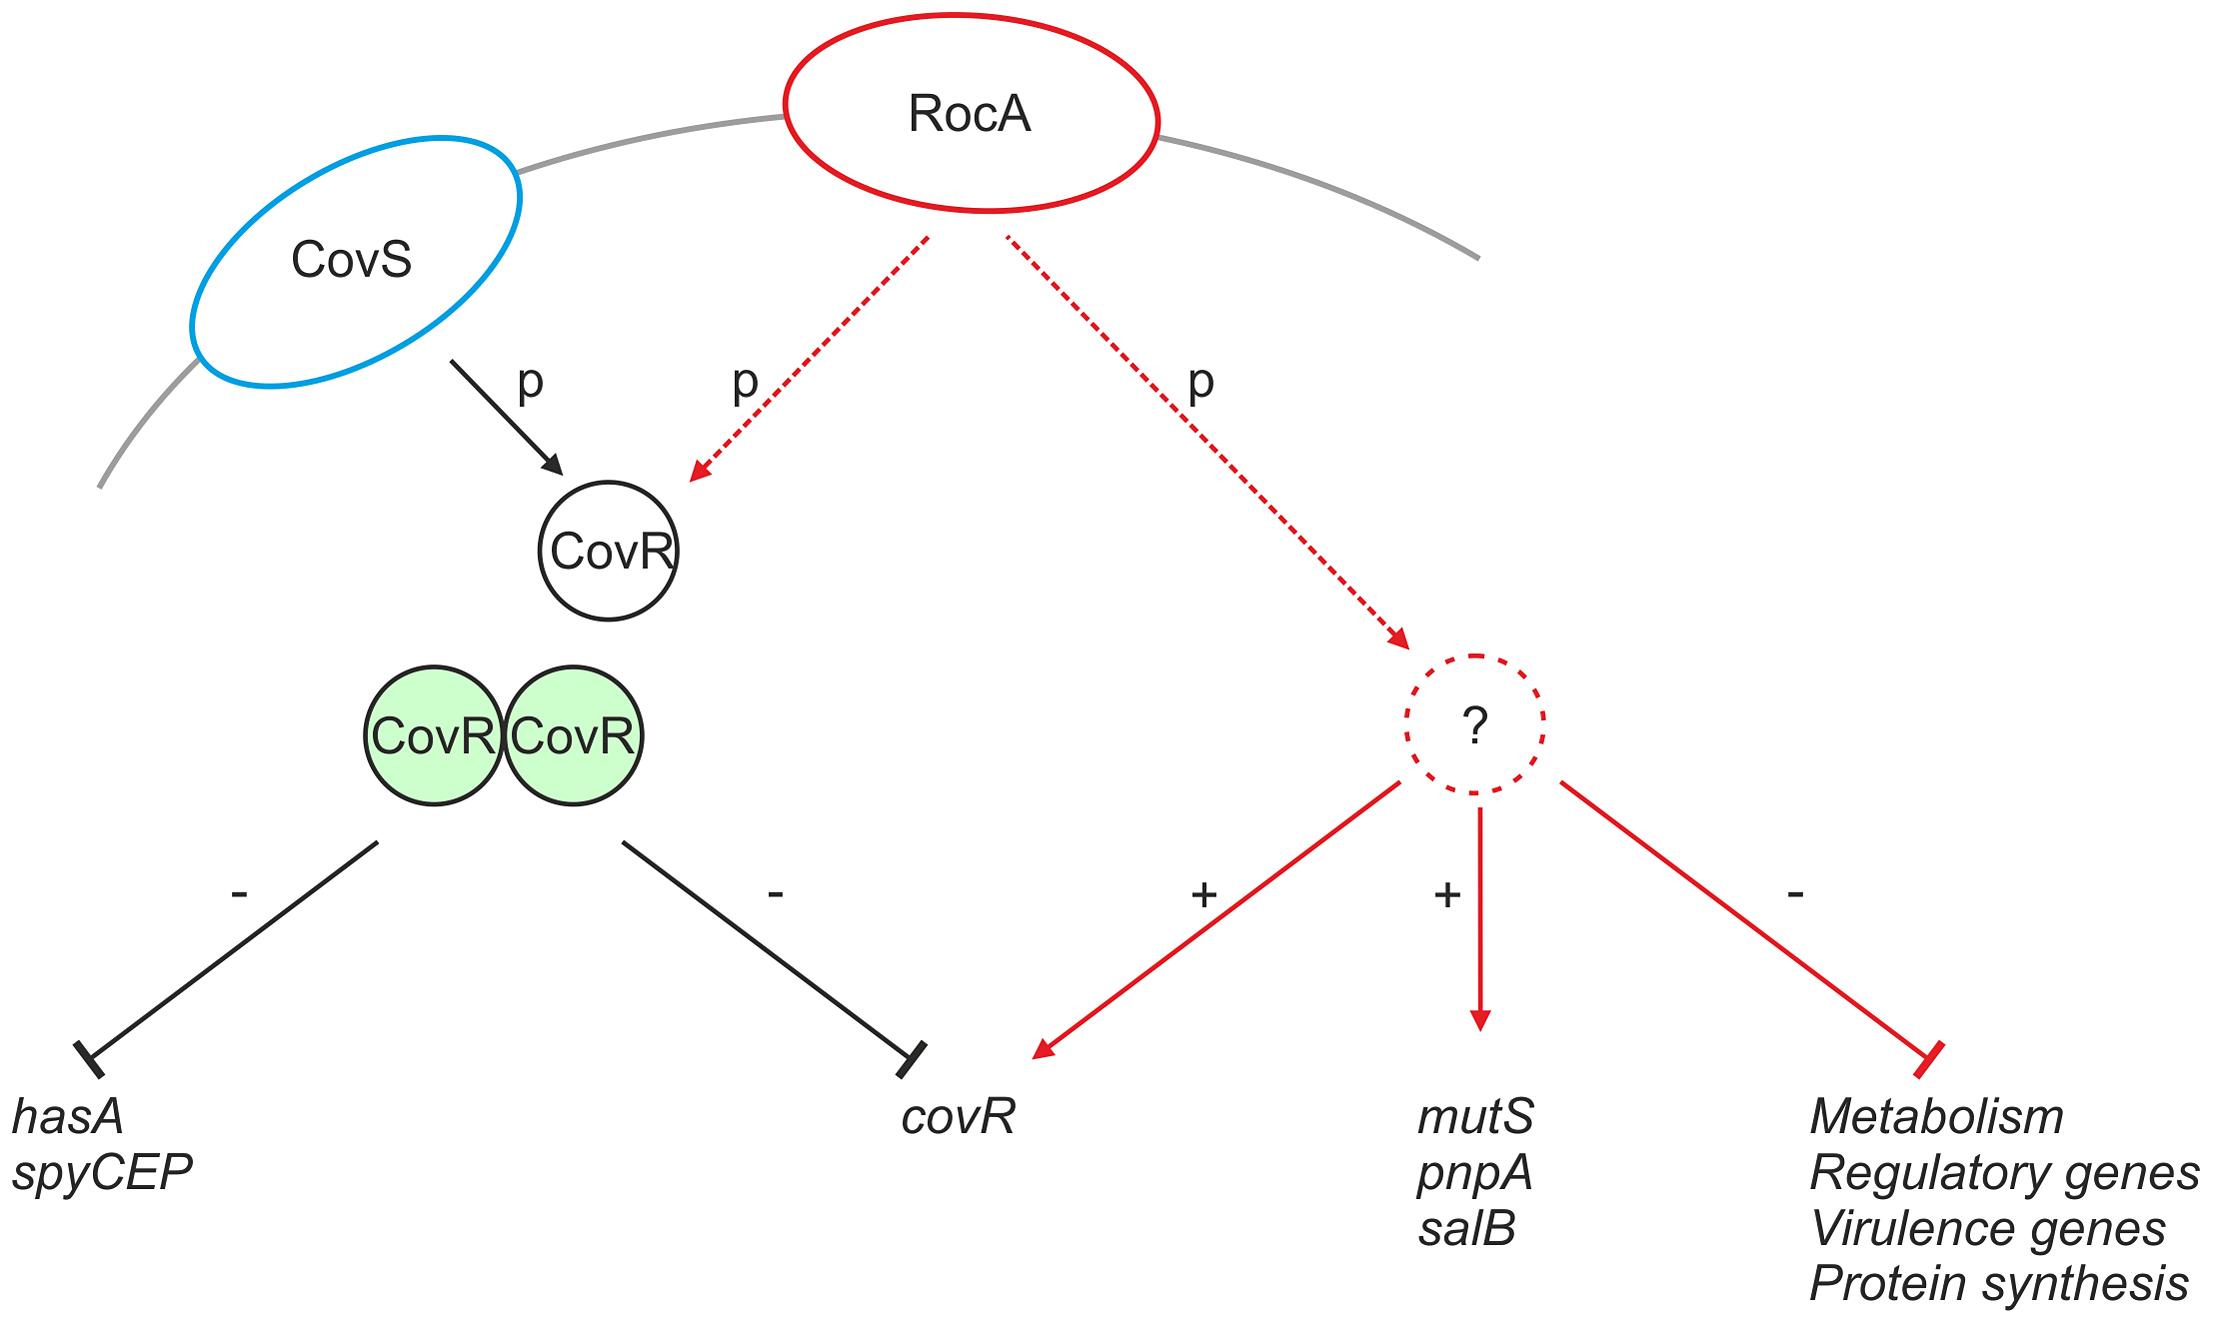 Proposed mechanism of RocA mediated activity.